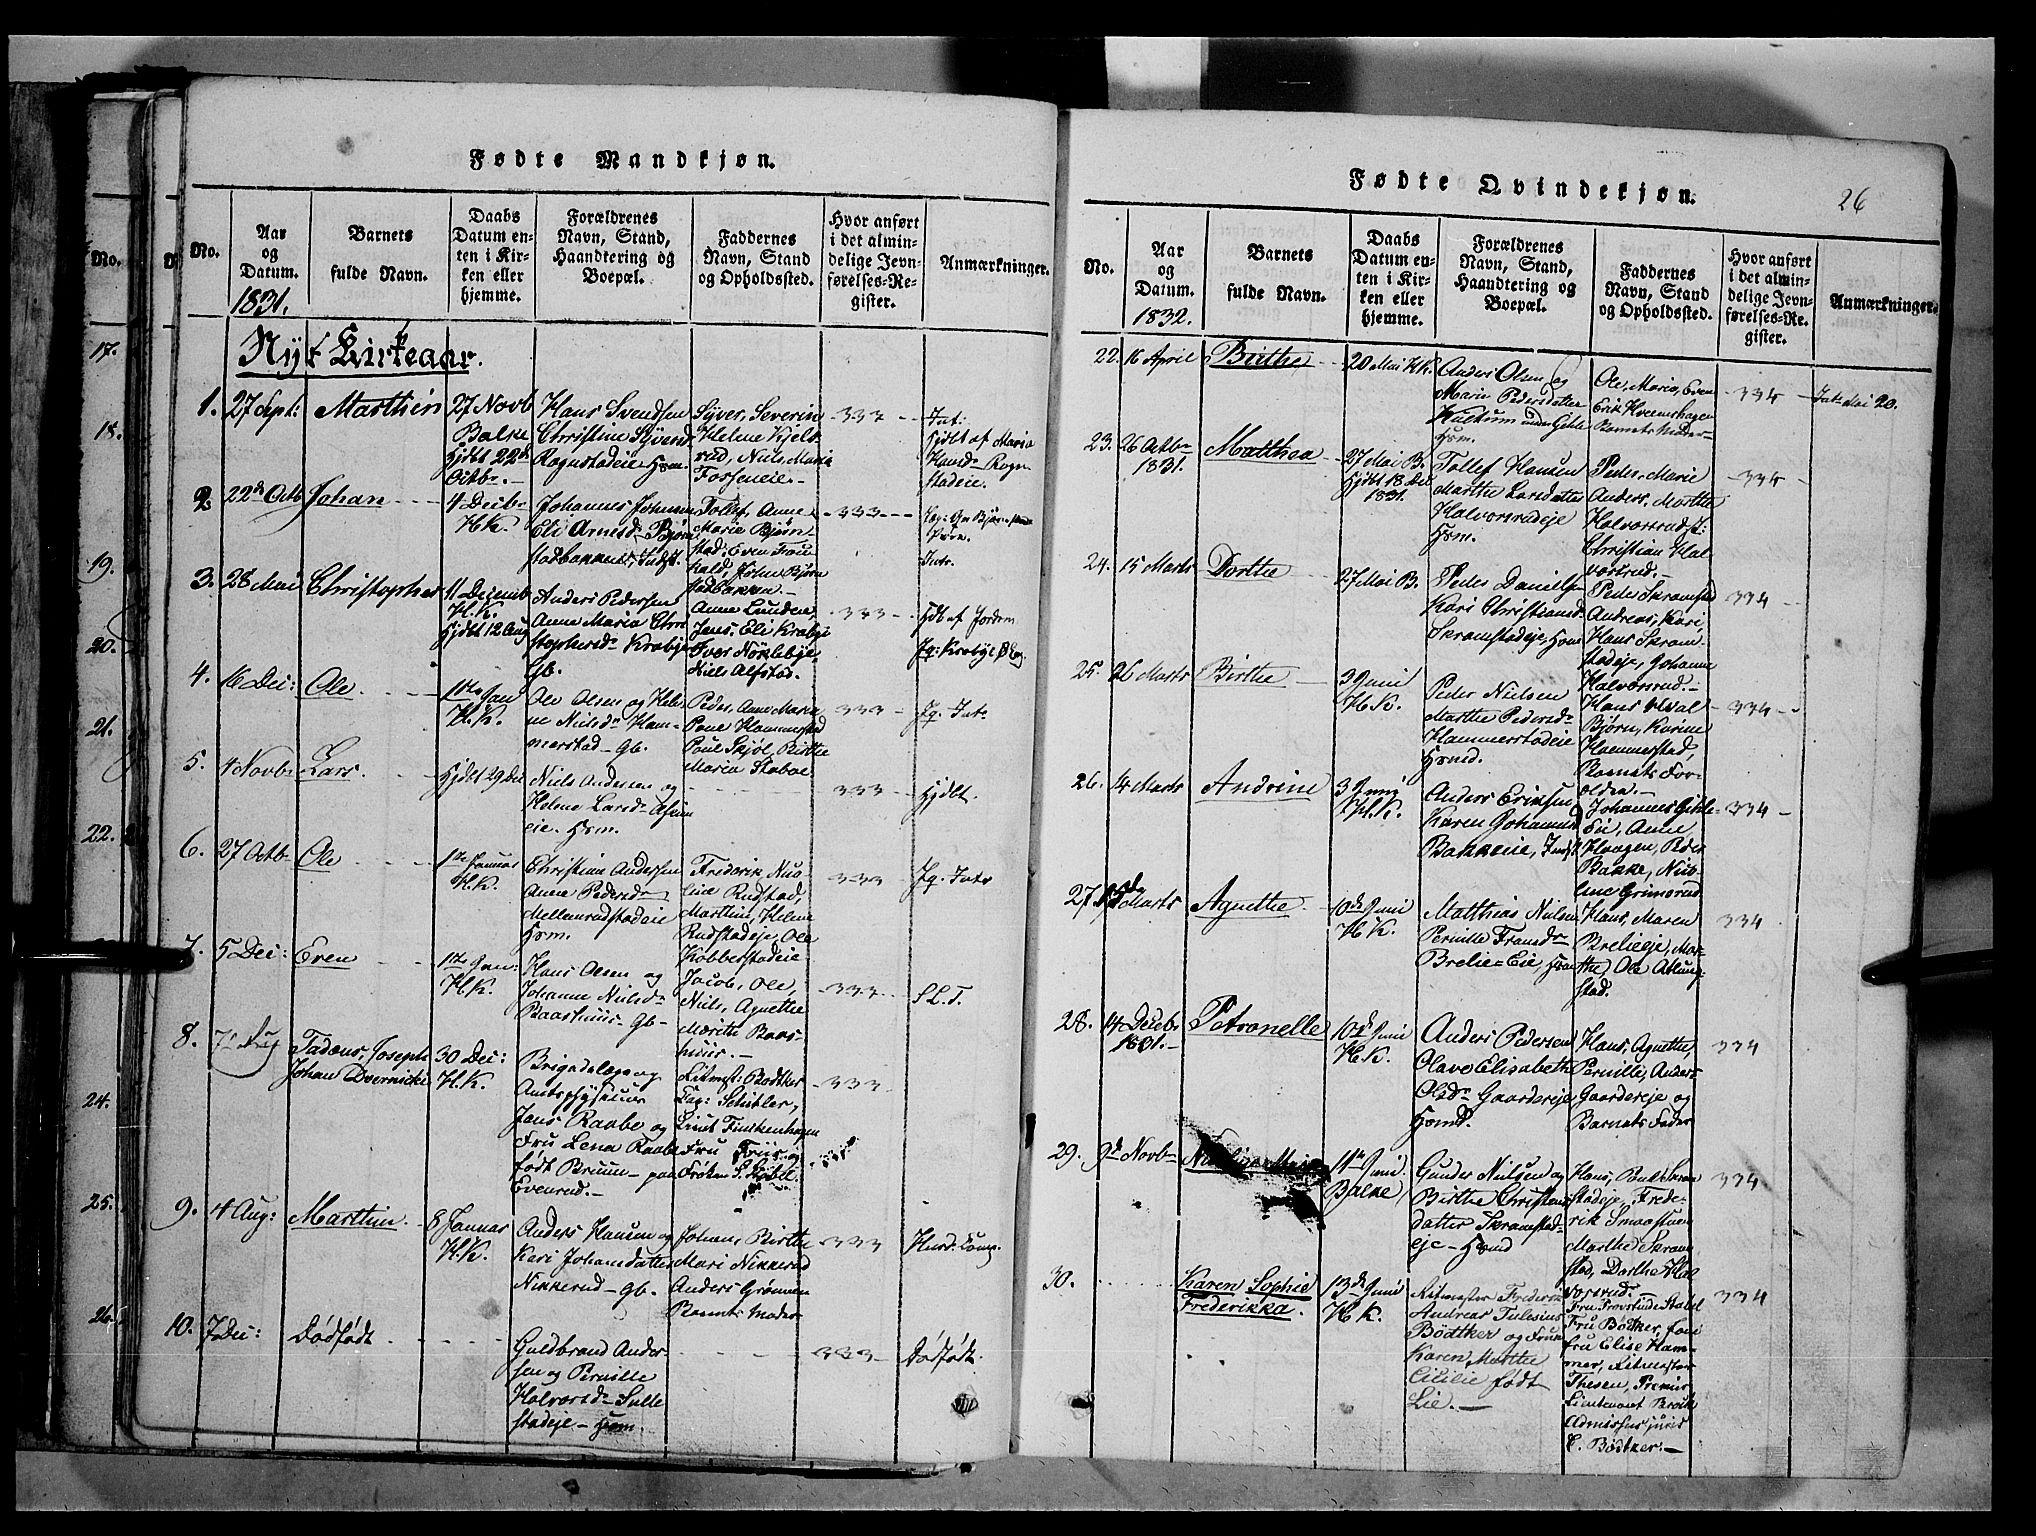 SAH, Østre Toten prestekontor, Ministerialbok nr. 1, 1828-1839, s. 26